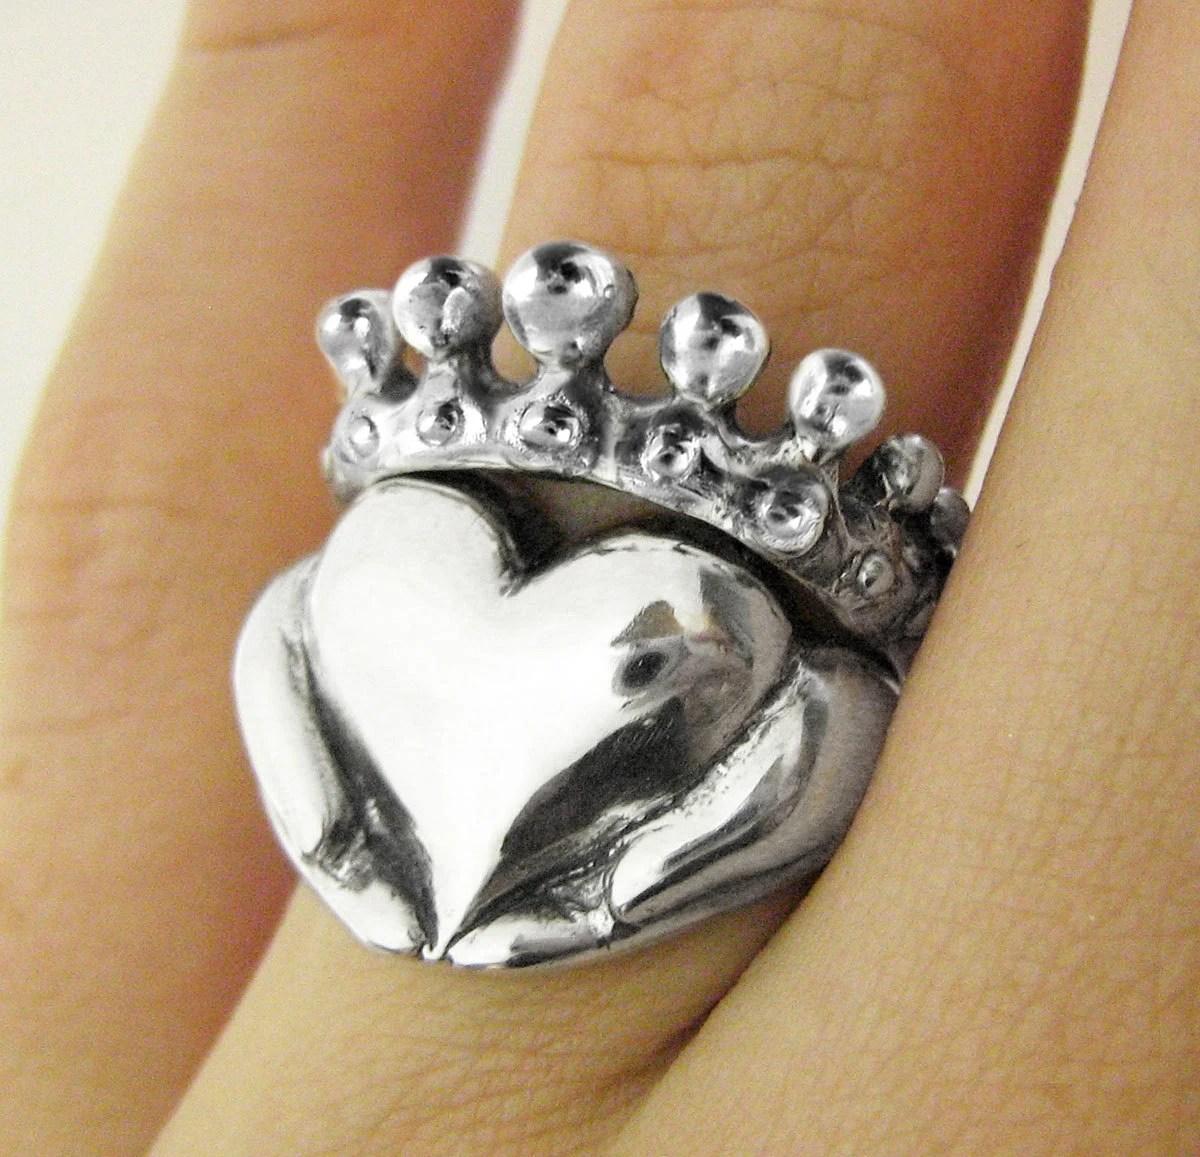 claddagh stacking rings alternative non traditional wedding rings Claddagh Stacking Rings Alternative Stacking Engagement Ring Non Traditional Wedding Ring Set for her Celtic Irsih Promise Ring 67 81b